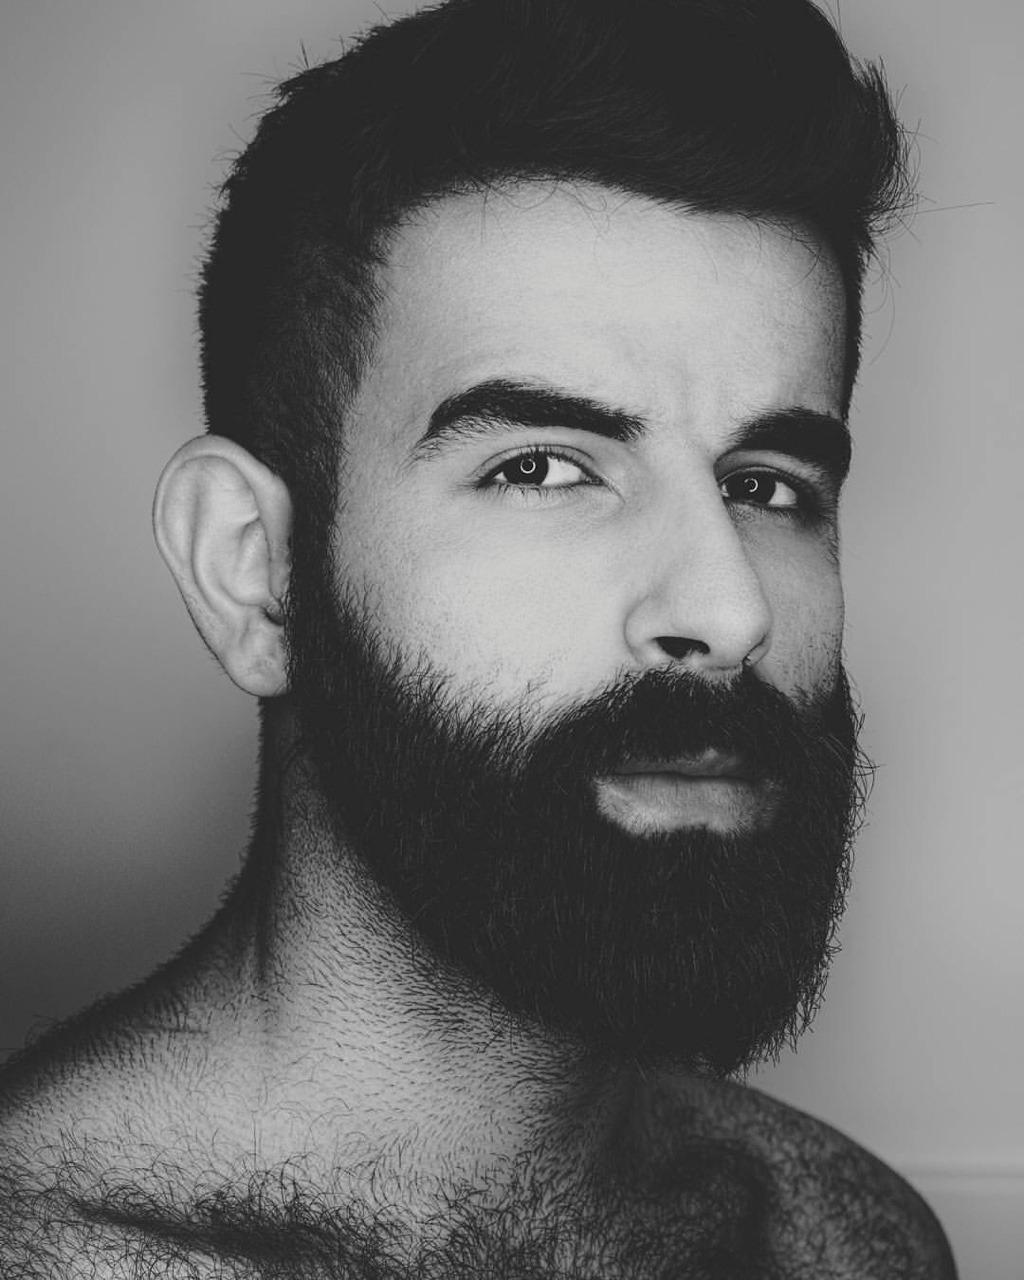 photo : ersoska instagram beardburnme https://www.neofic.com